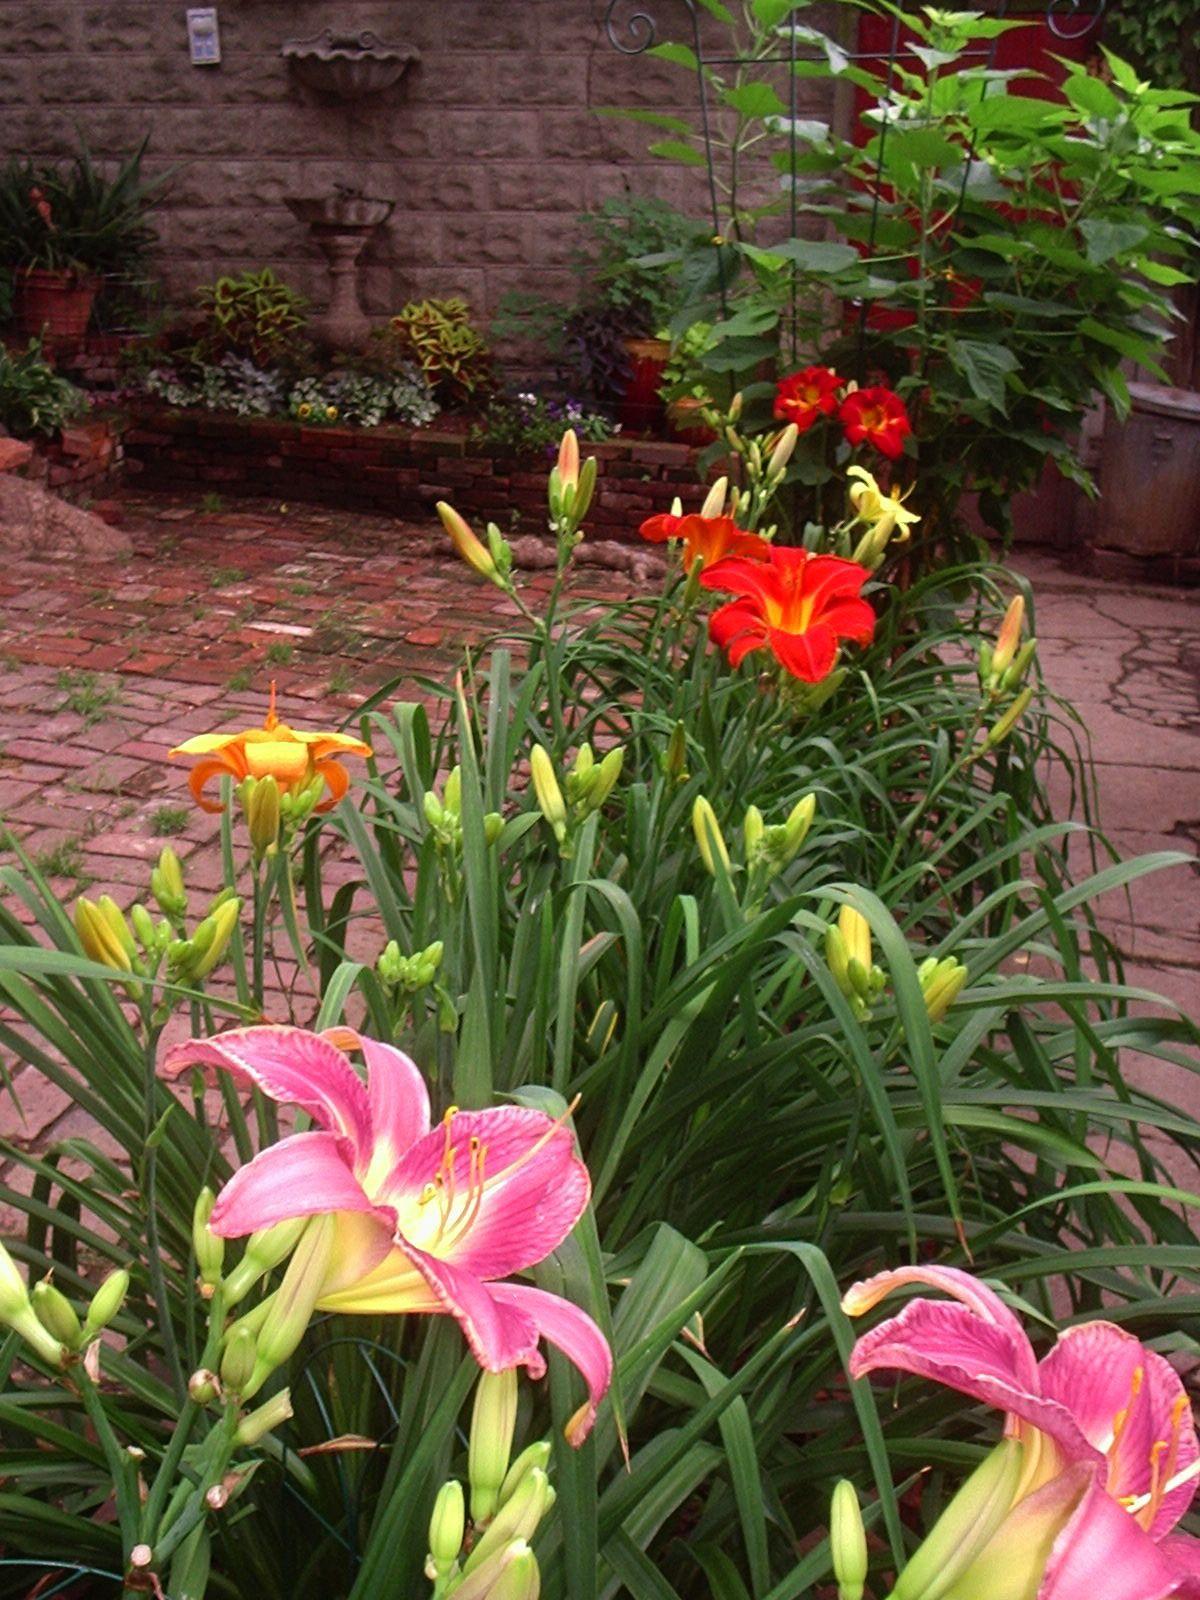 Lily Garden My Back Yard Pinterest Lily Garden Garden And Iris Garden